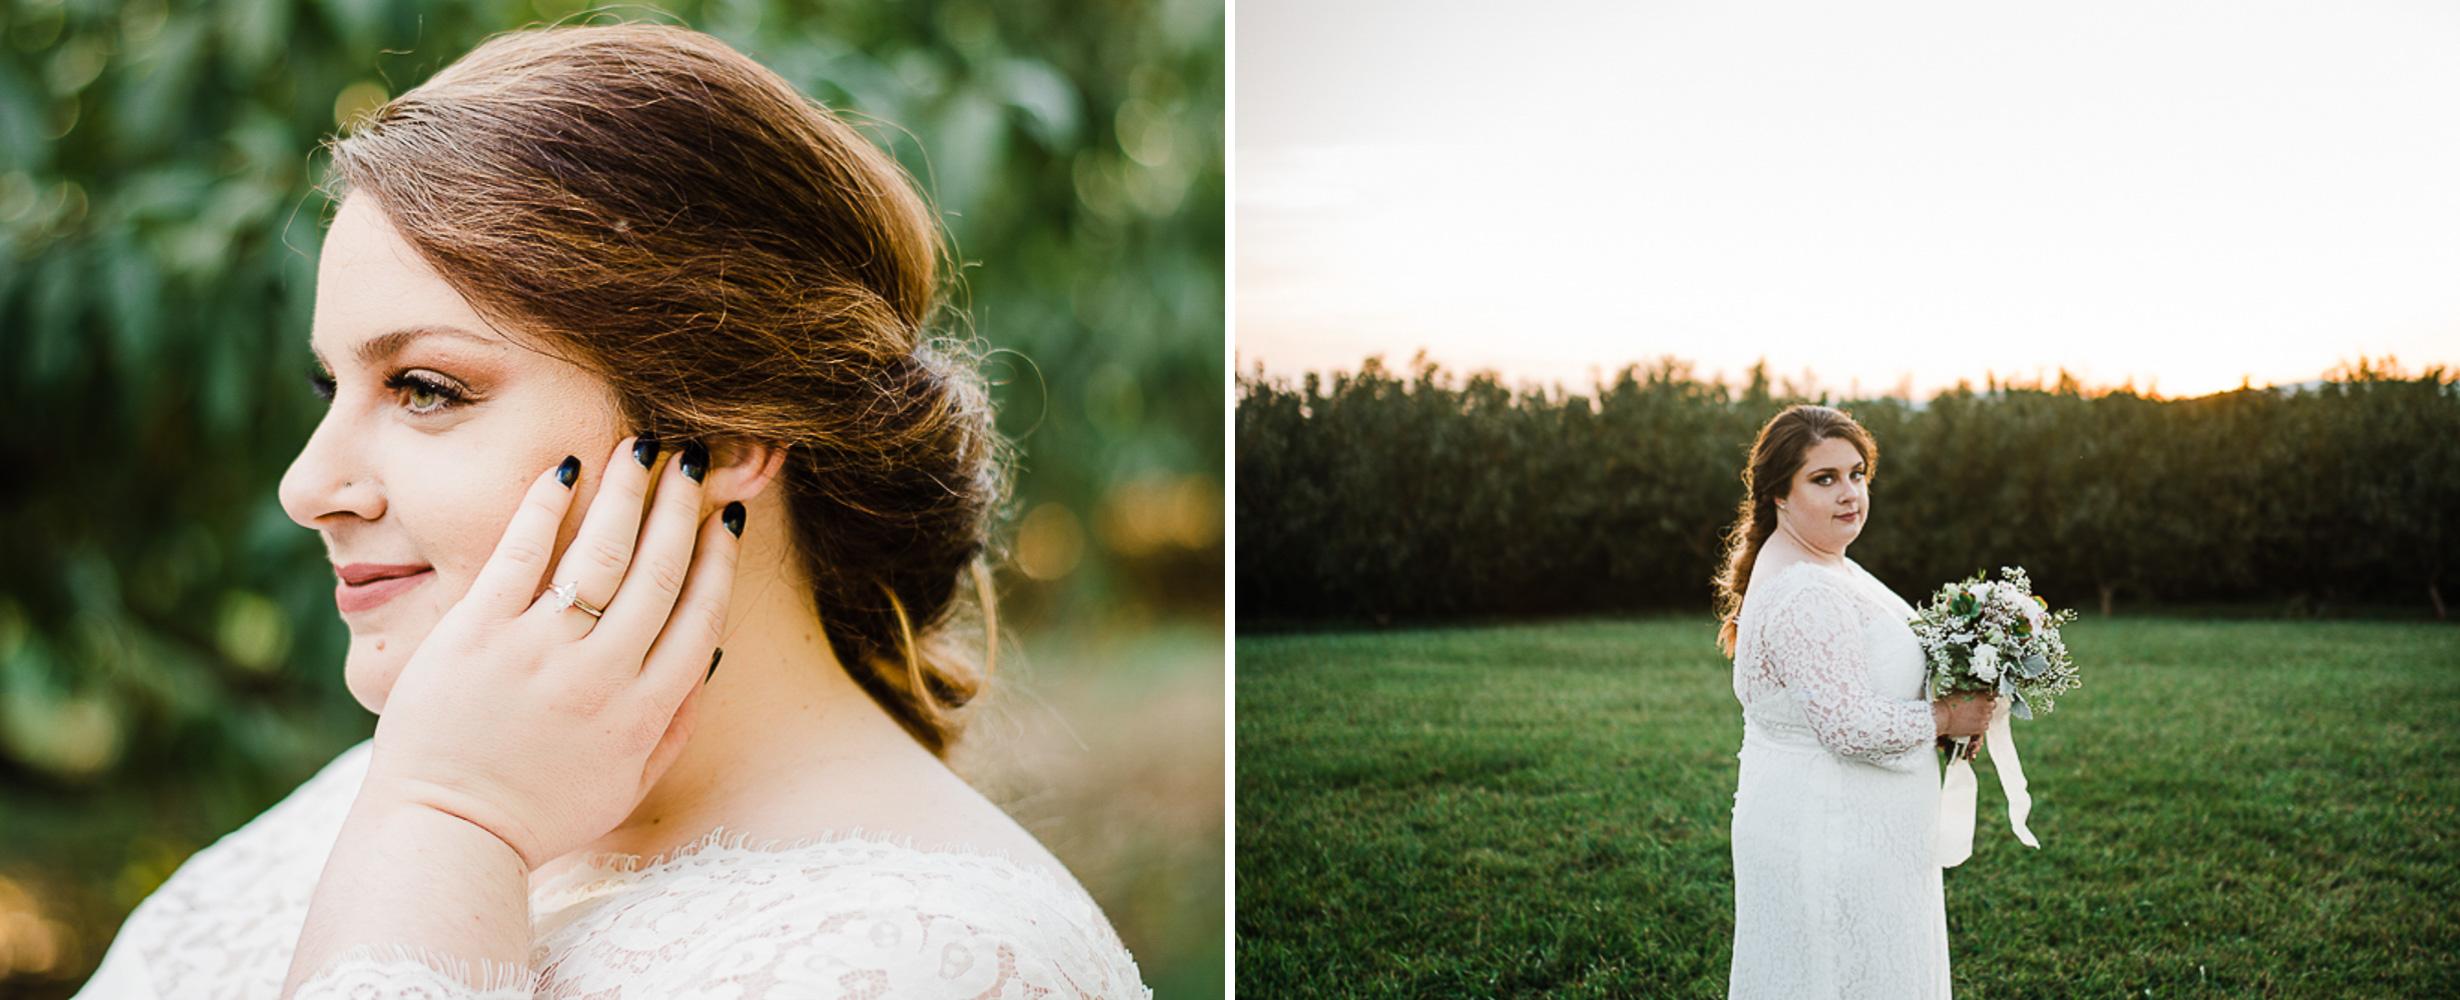 Bridal Portraits, Mountain, succulent, vineyard Bridal, 14.jpg